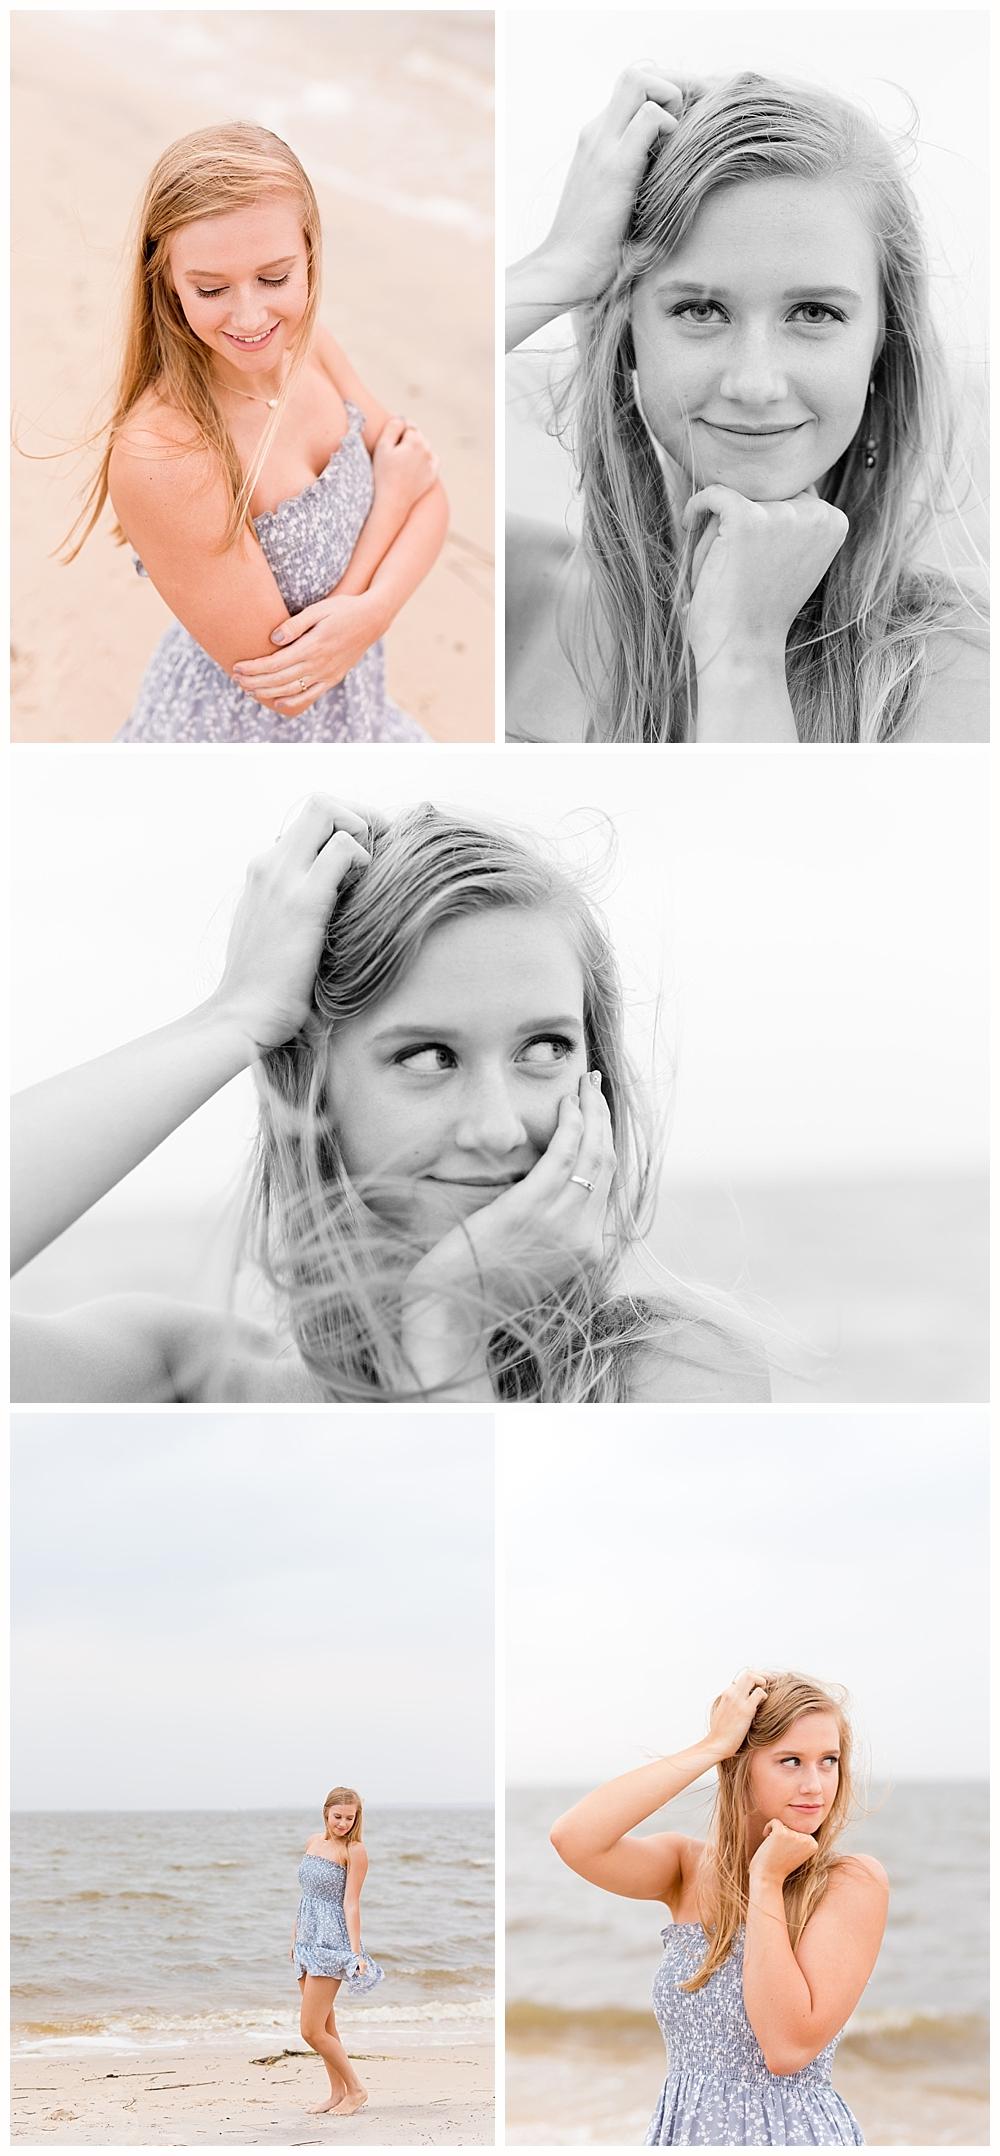 senior casuals at East Beach in Ocean Springs - Mississippi senior portrait photographer